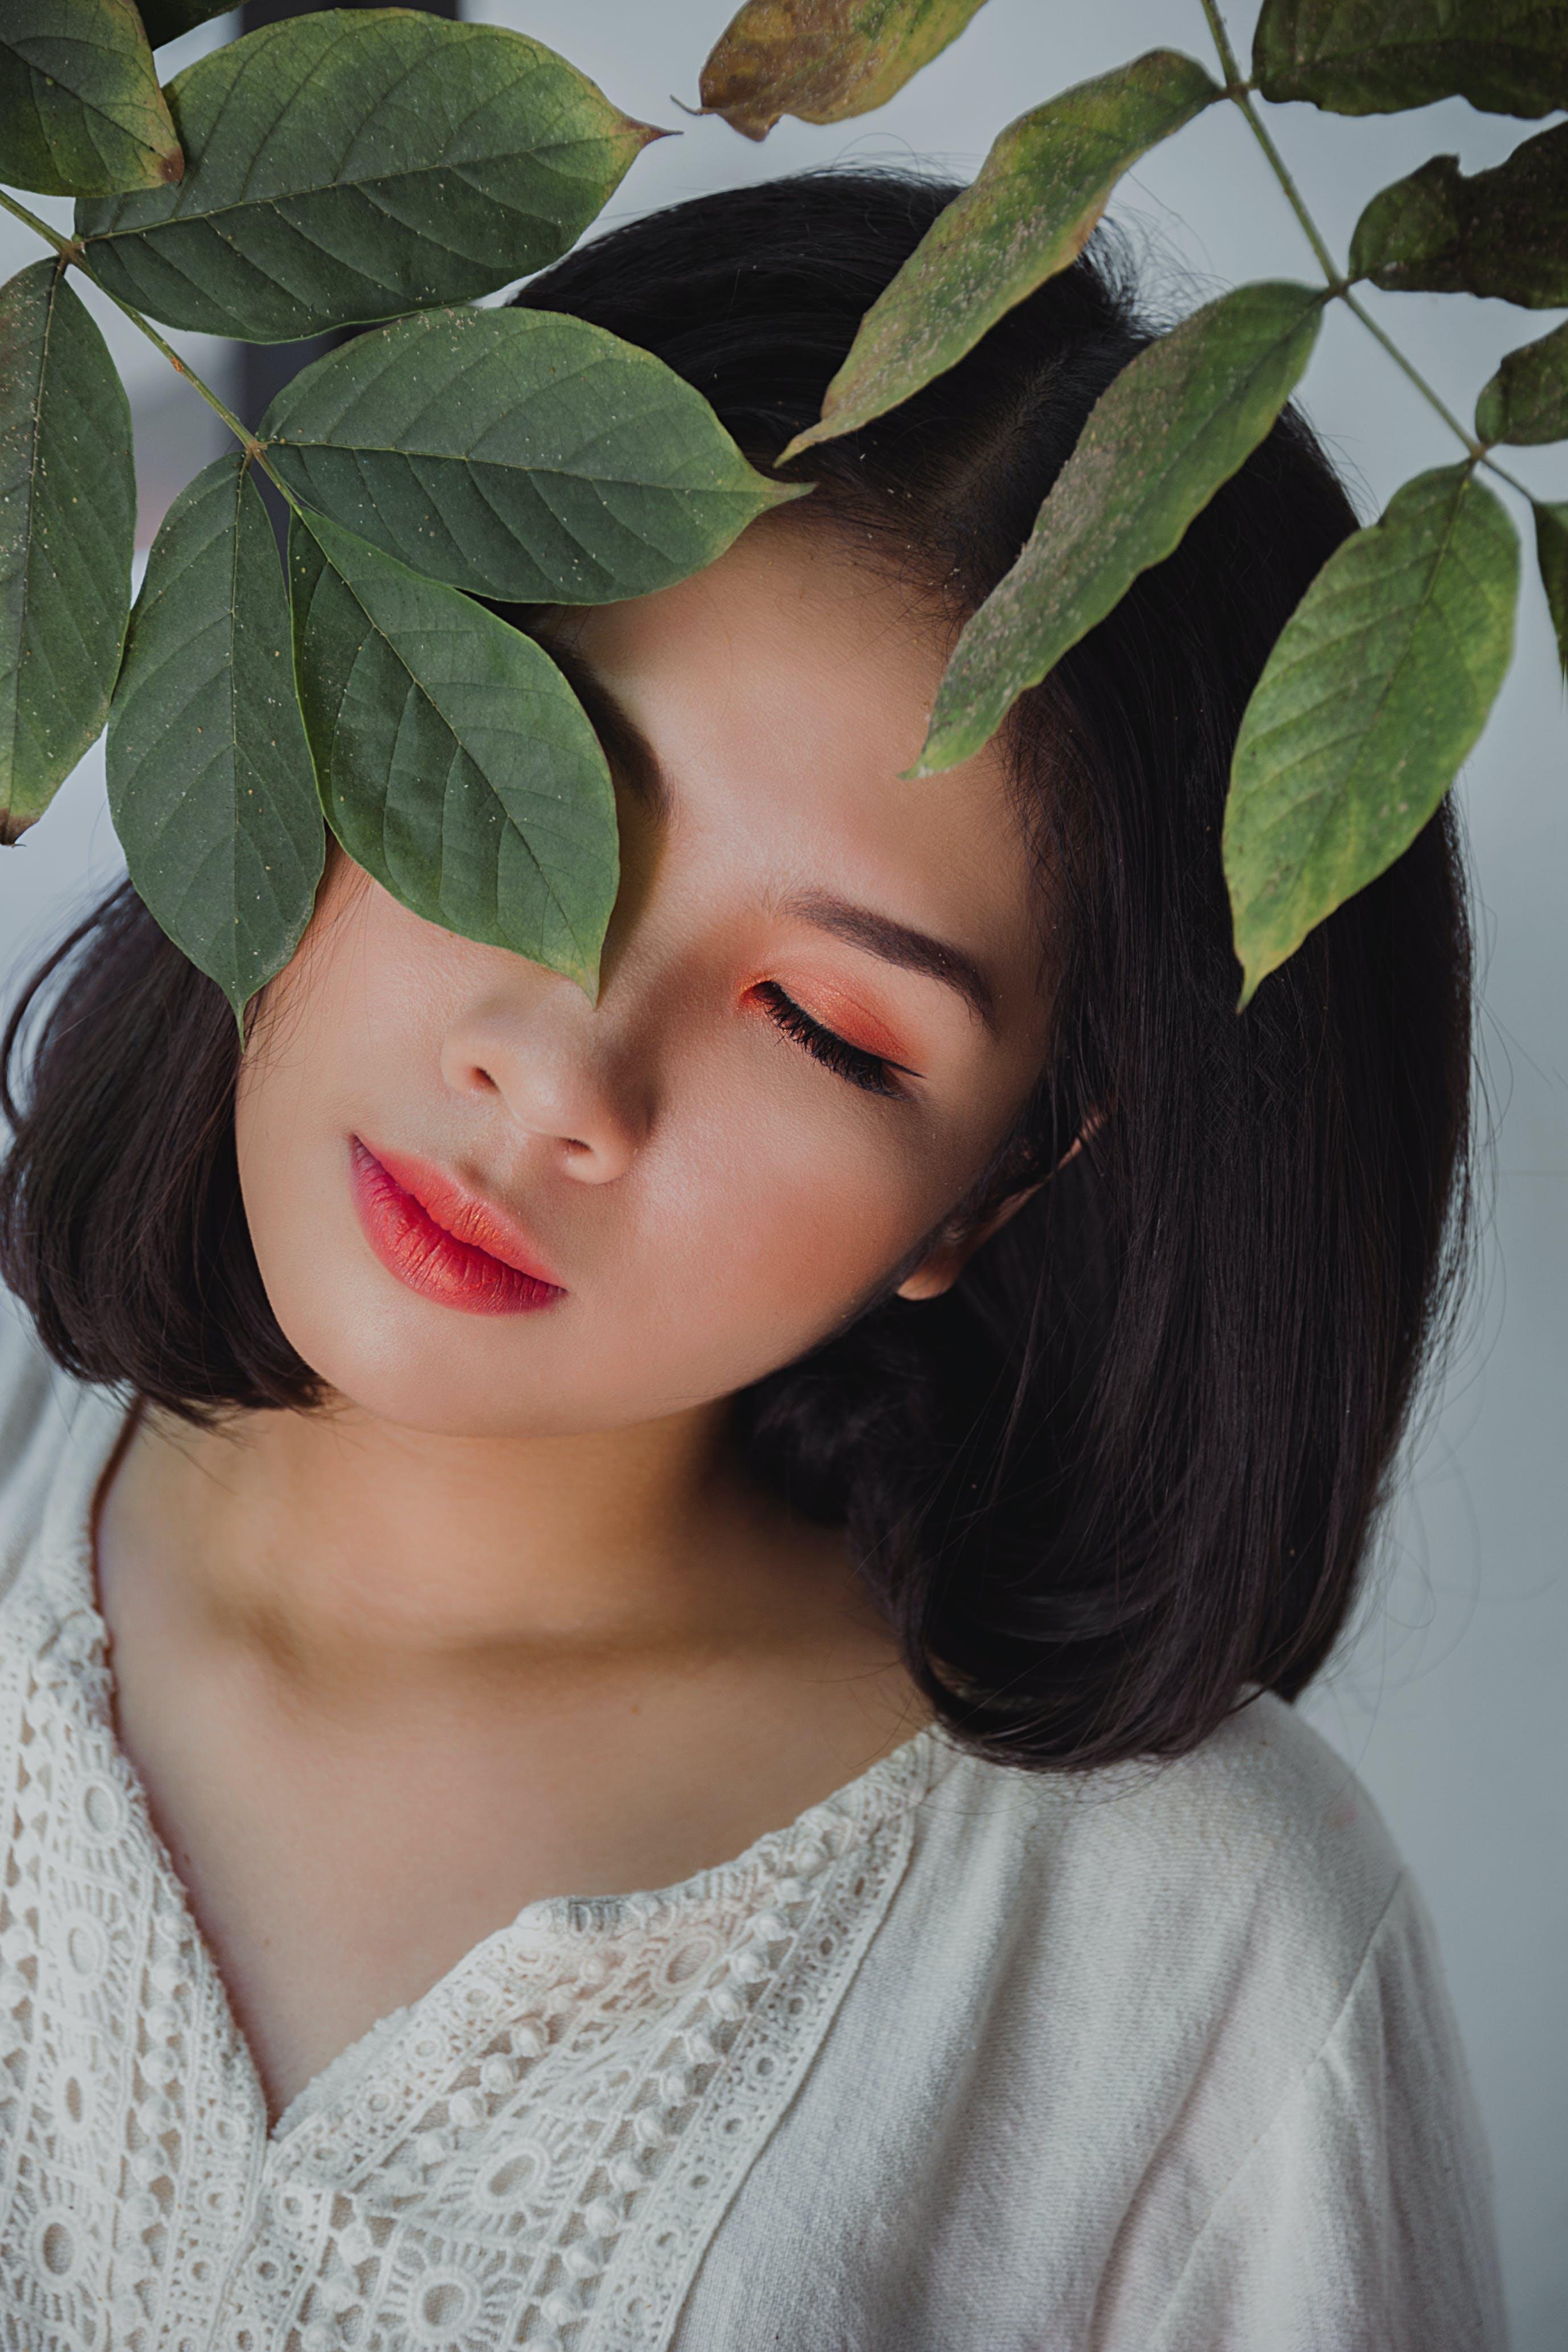 Woman Wearing Beige V-neck Shirt Under Tree